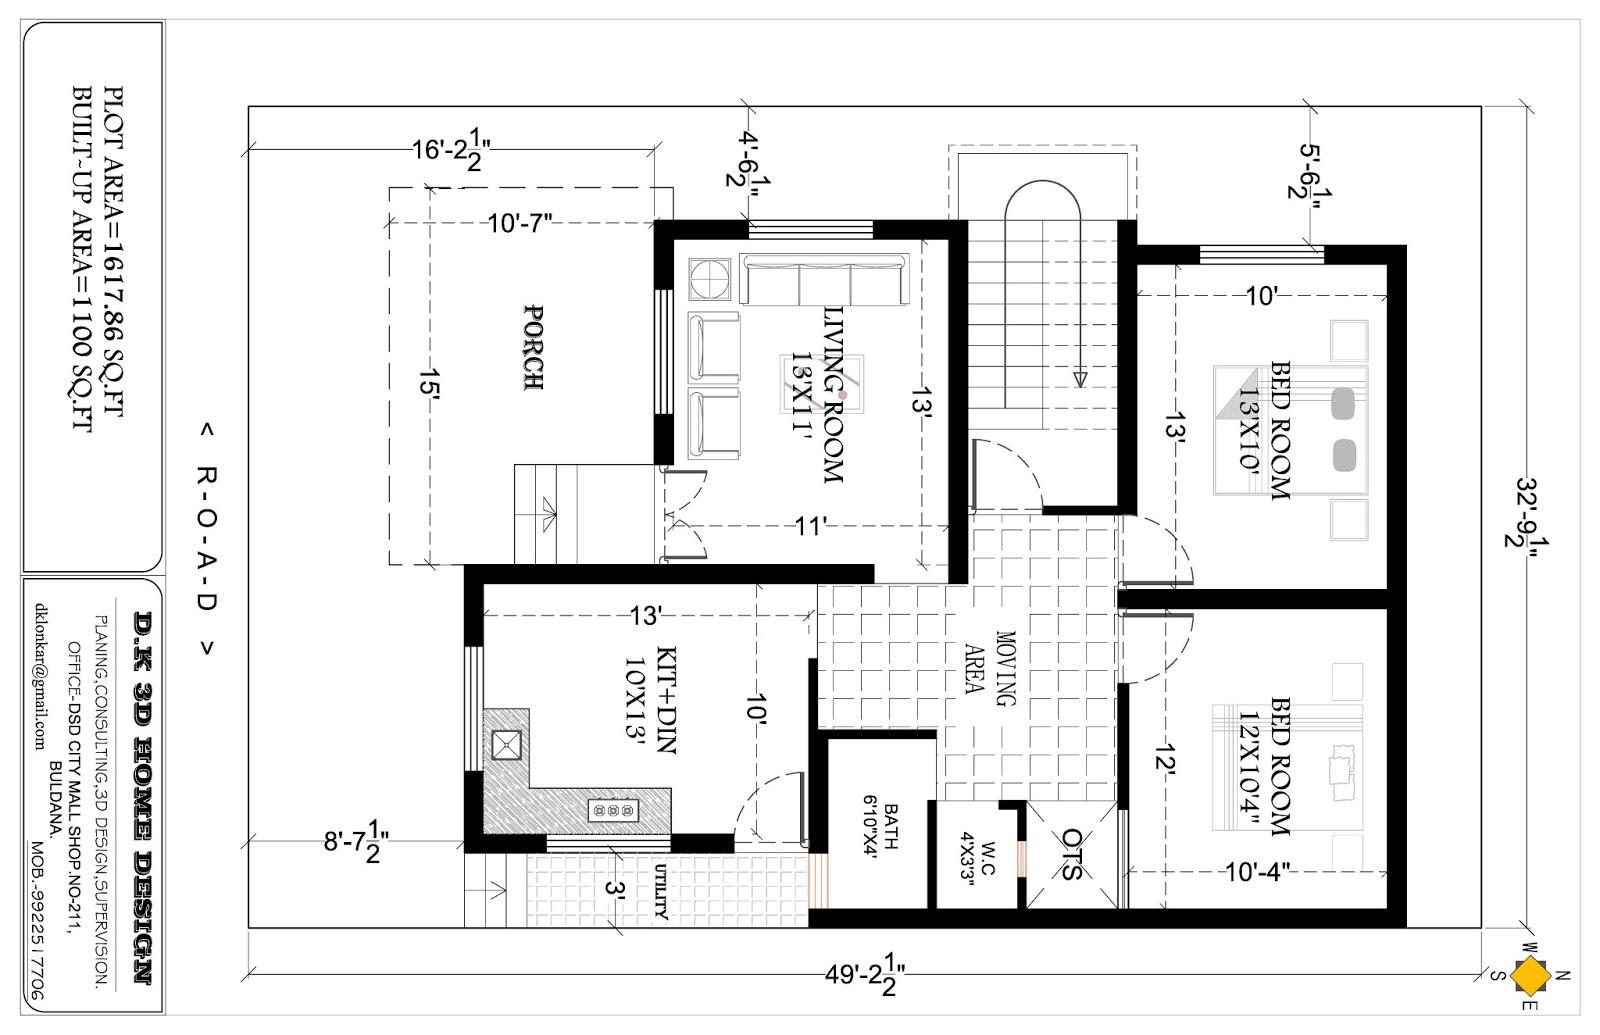 33\'X50\' FEET HOUSE PLAN